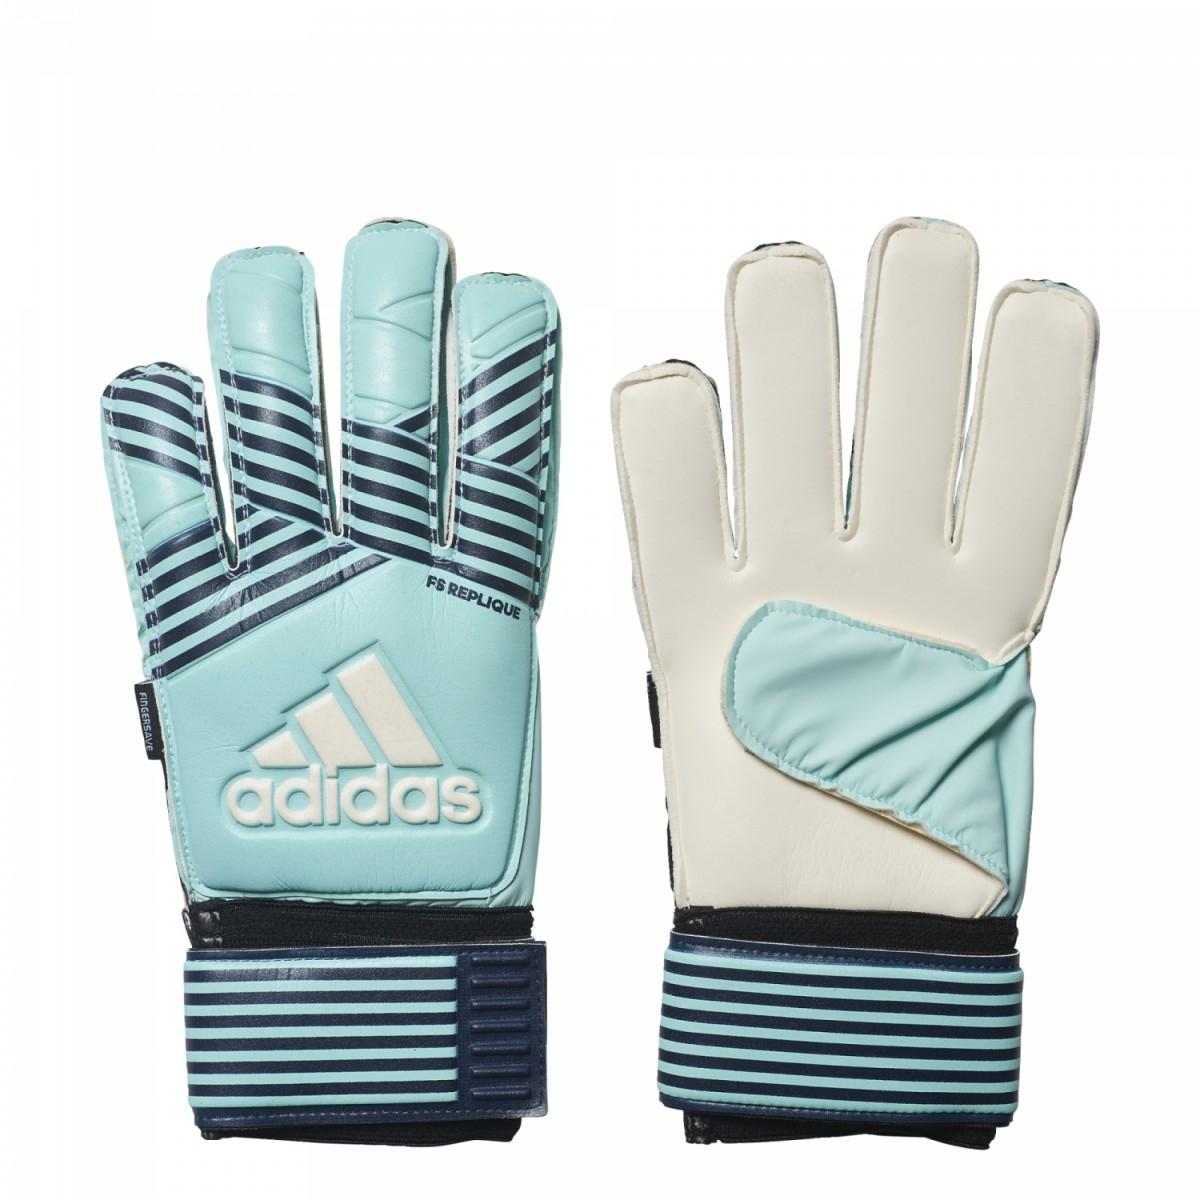 adidas ACE Fingersave Replique Torwarthandschuhe Herren Fußball blau